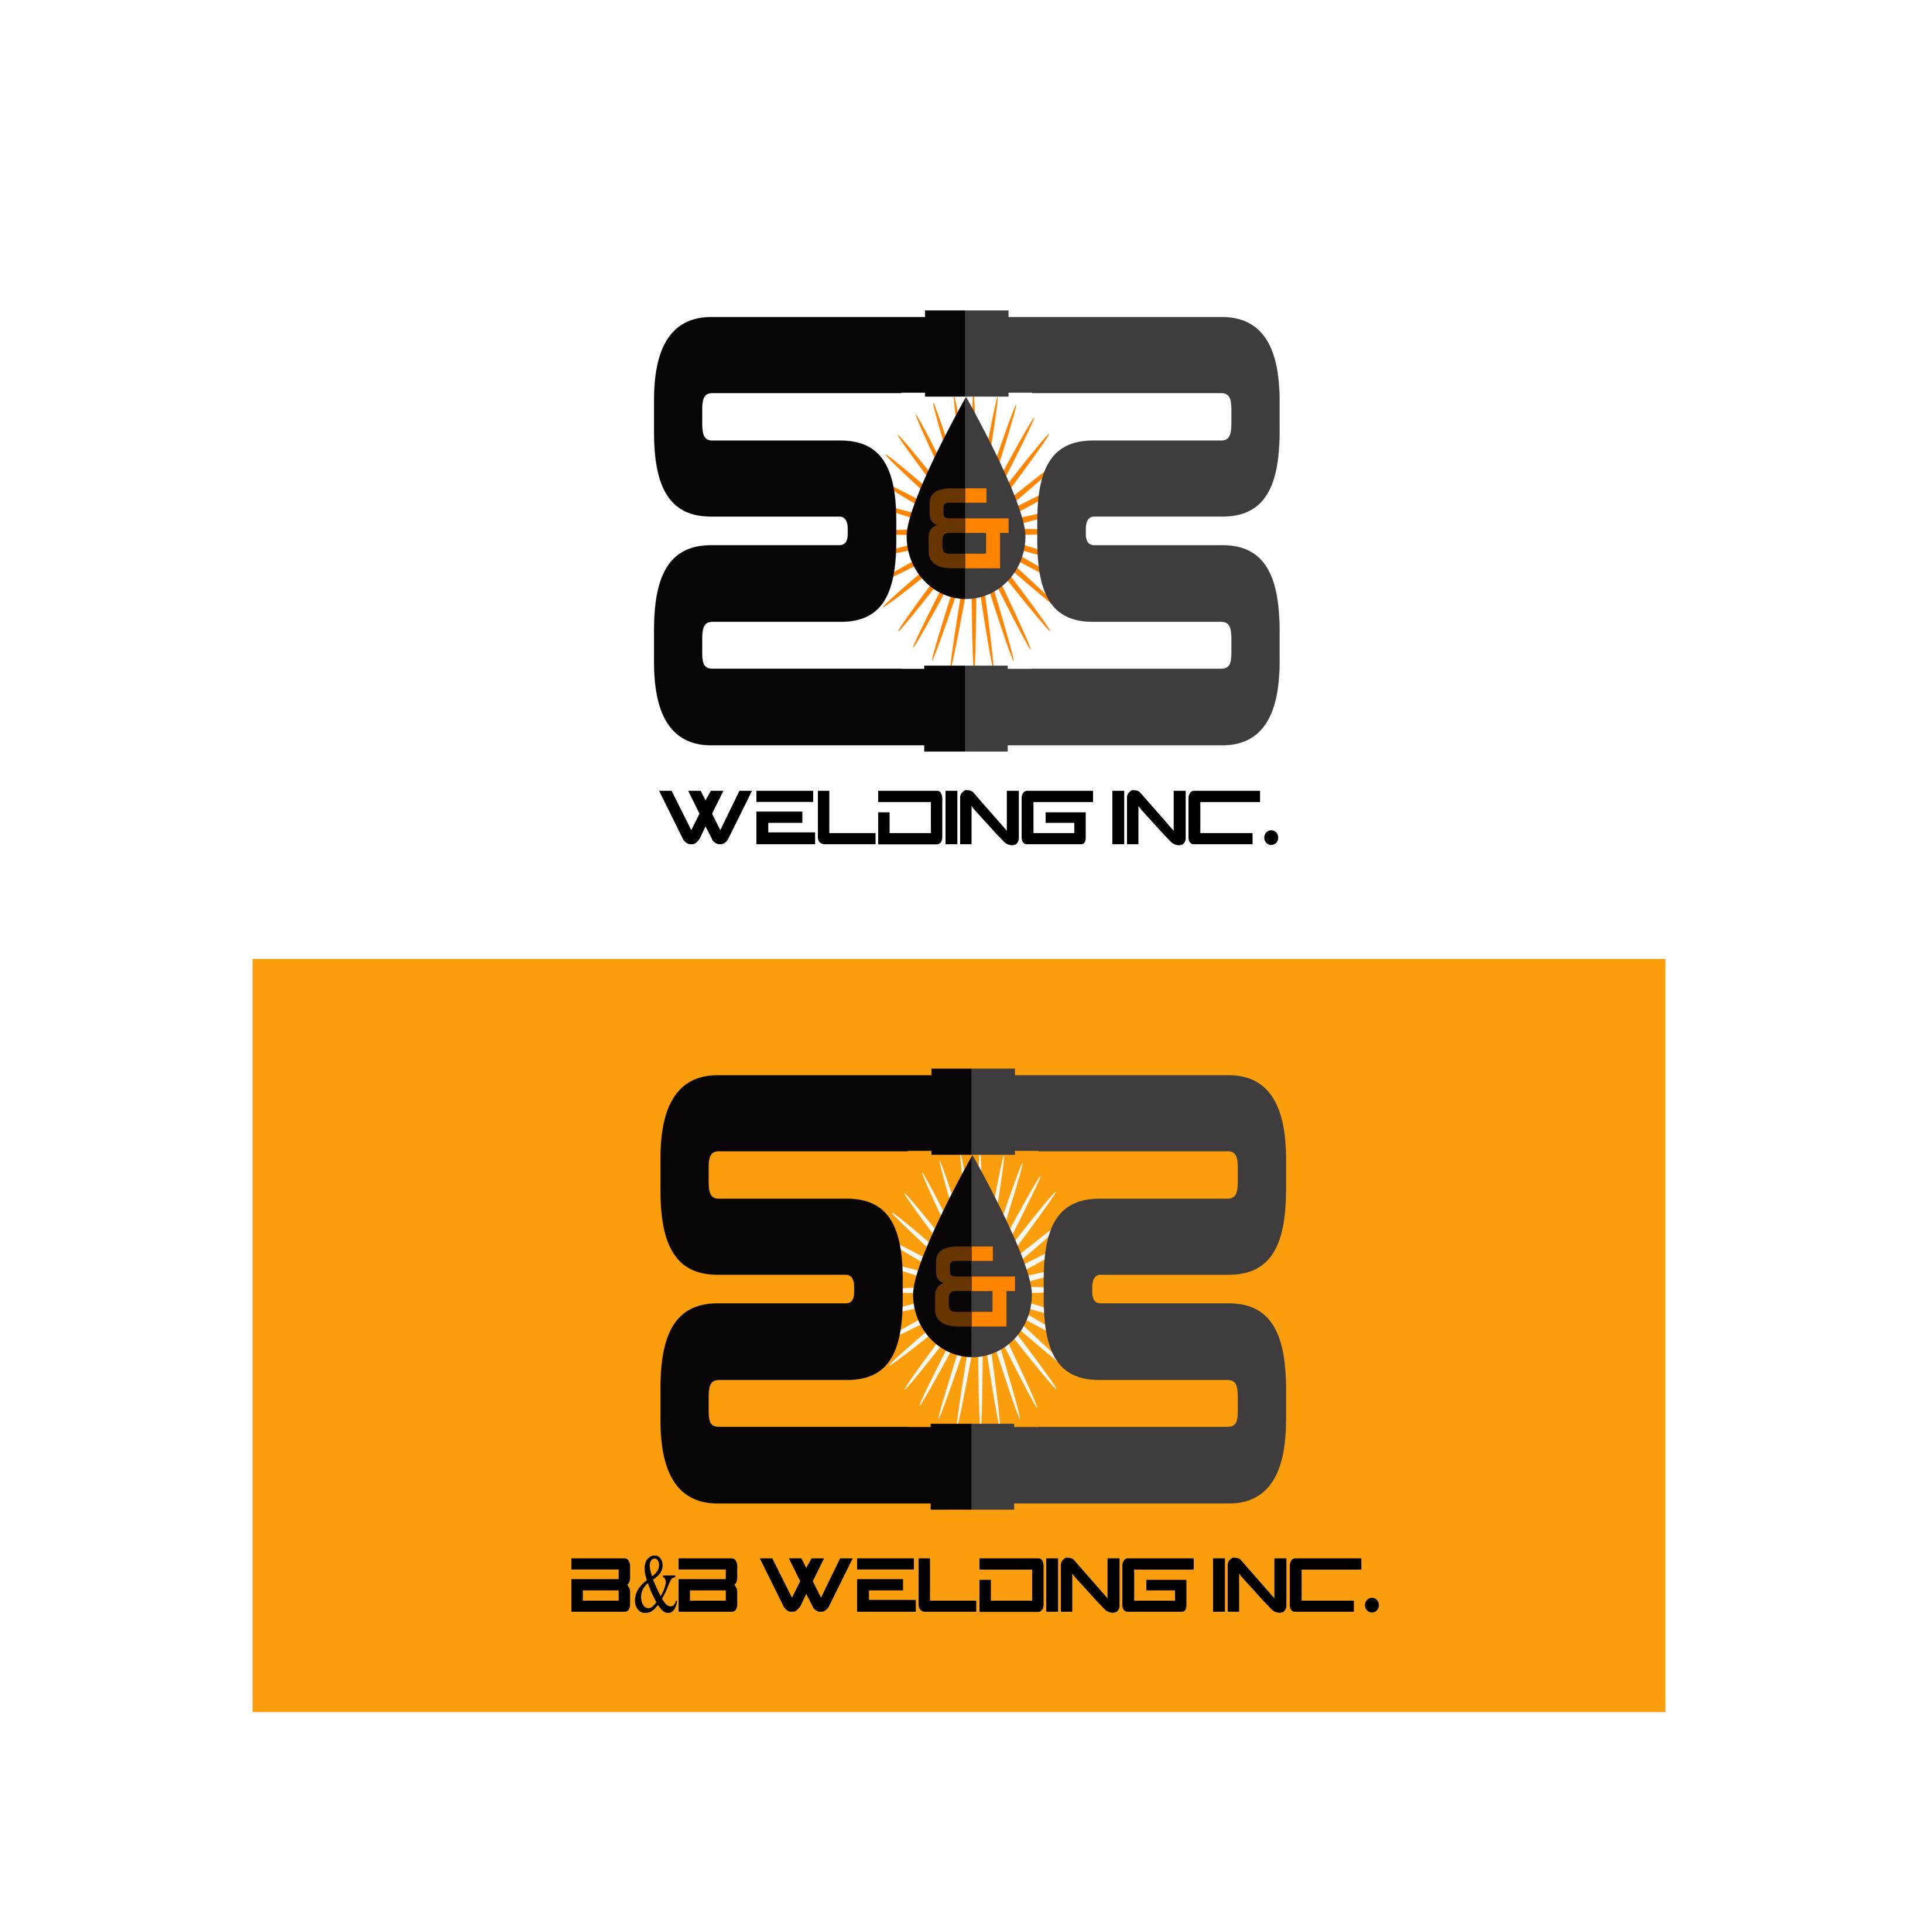 Logo Design by Allan Esclamado - Entry No. 49 in the Logo Design Contest Fun Logo Design for B&B Welding Inc..